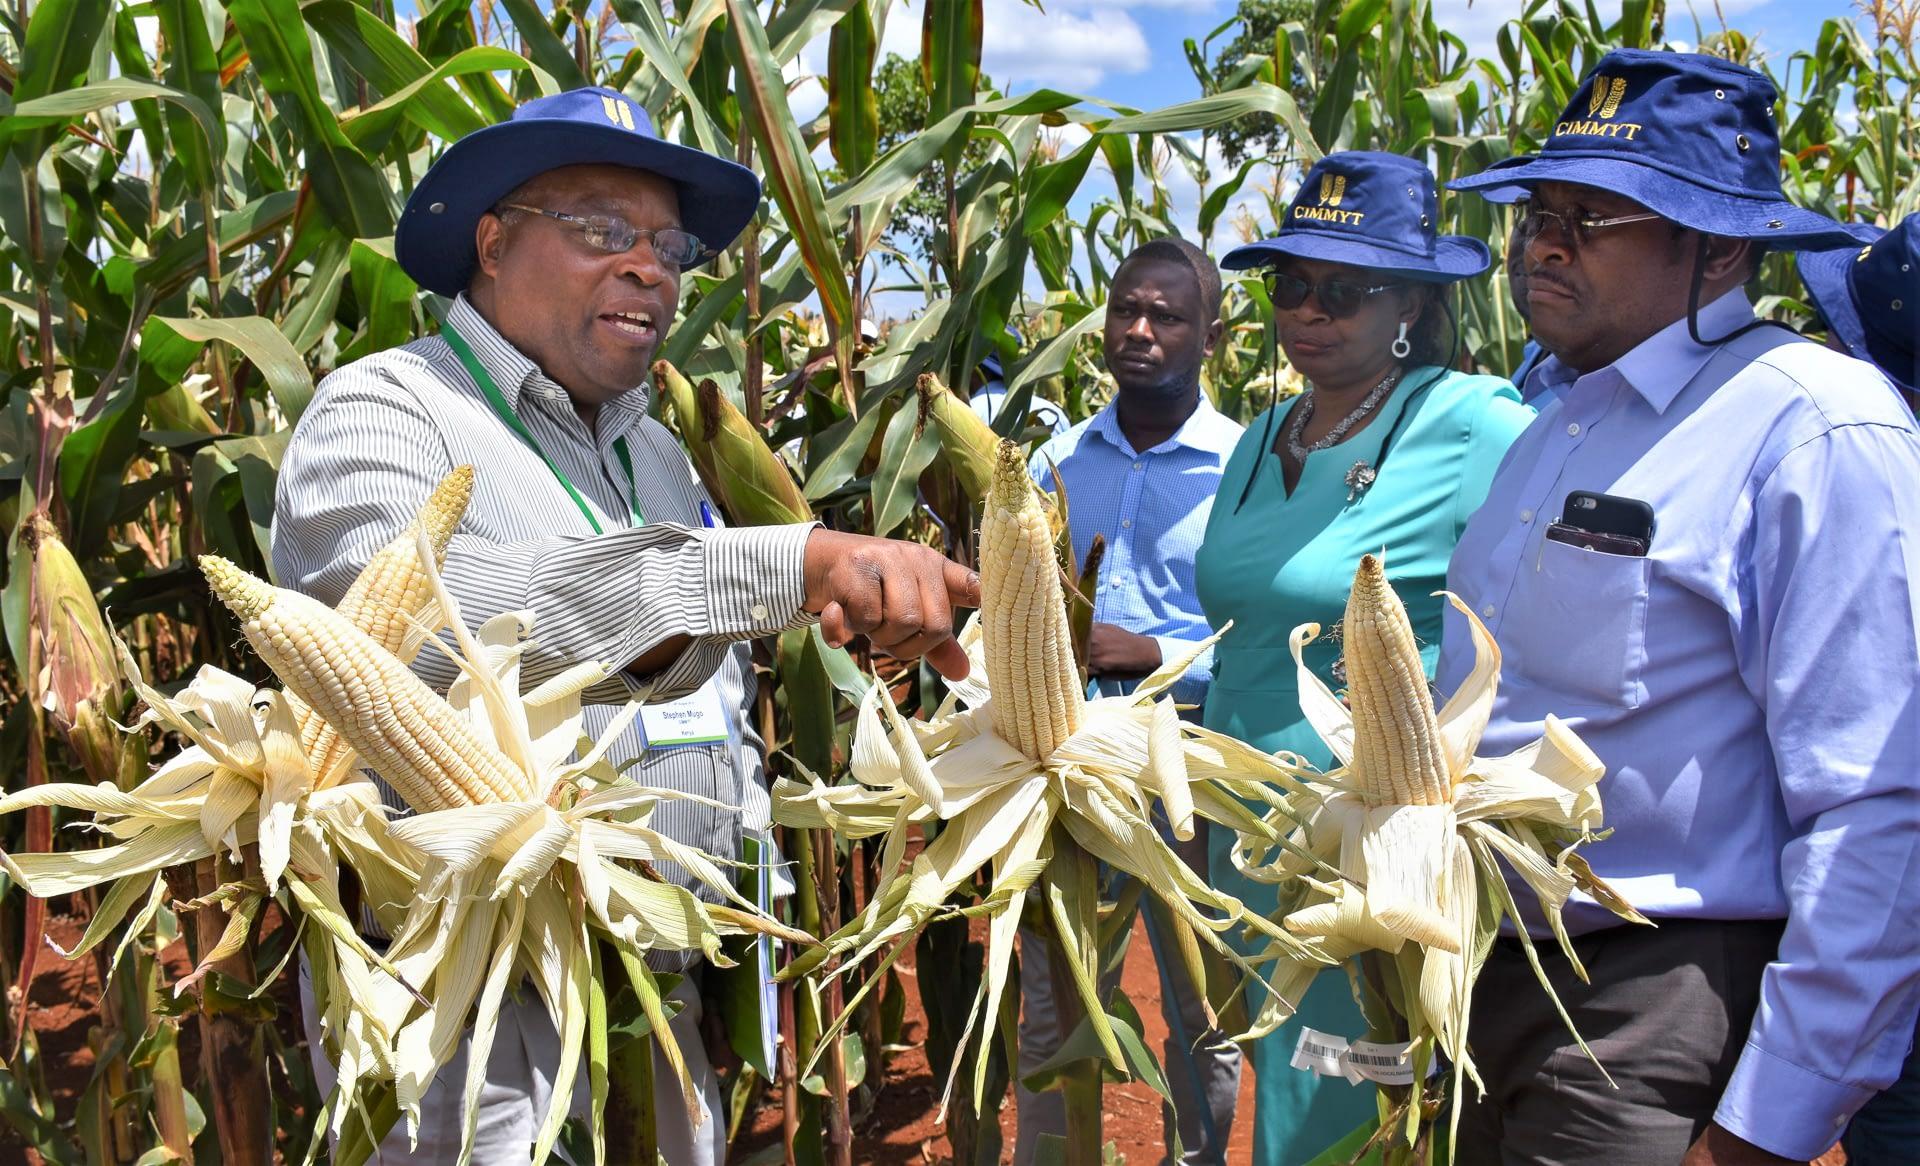 Stephen Mugo (left) shows grain filling to Felister Makini of KALRO and Oscar Magenya, from Kenya's Ministry of Agriculture. (Photo: Joshua Masinde/CIMMYT)